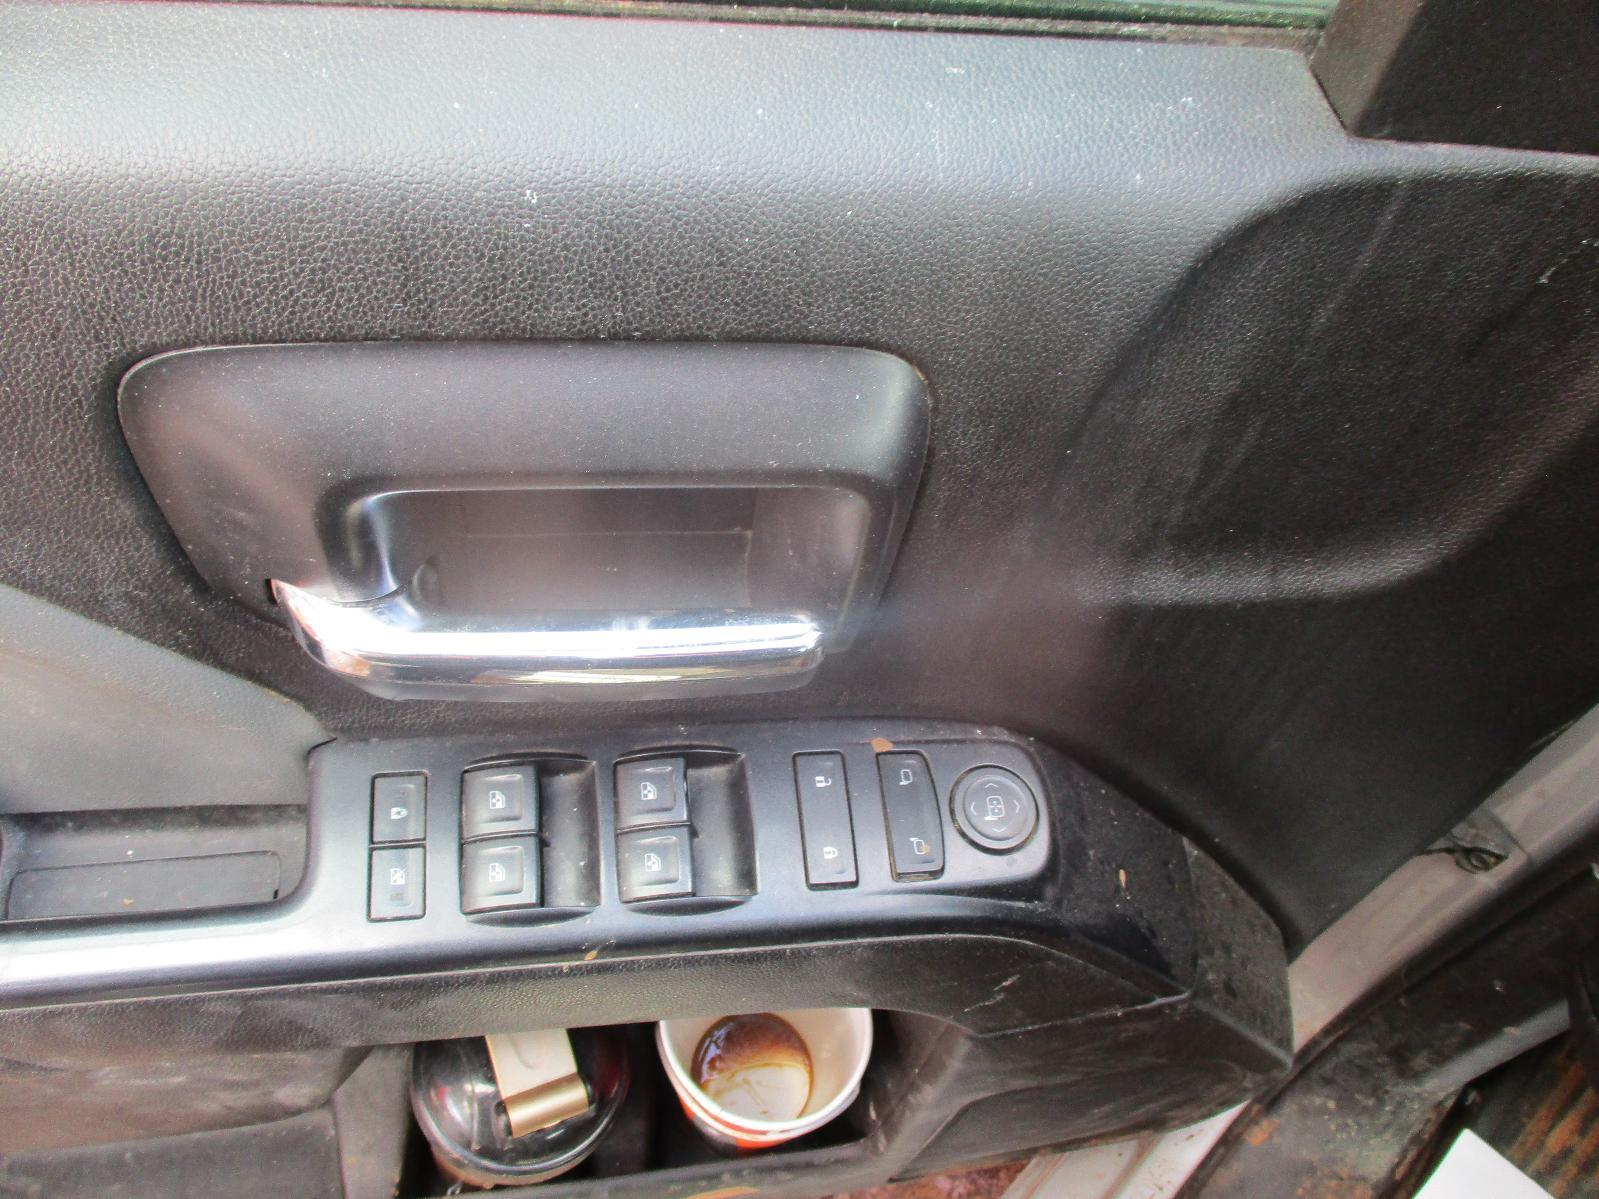 2017 Chevrolet Silverado1500  – #C00186 full